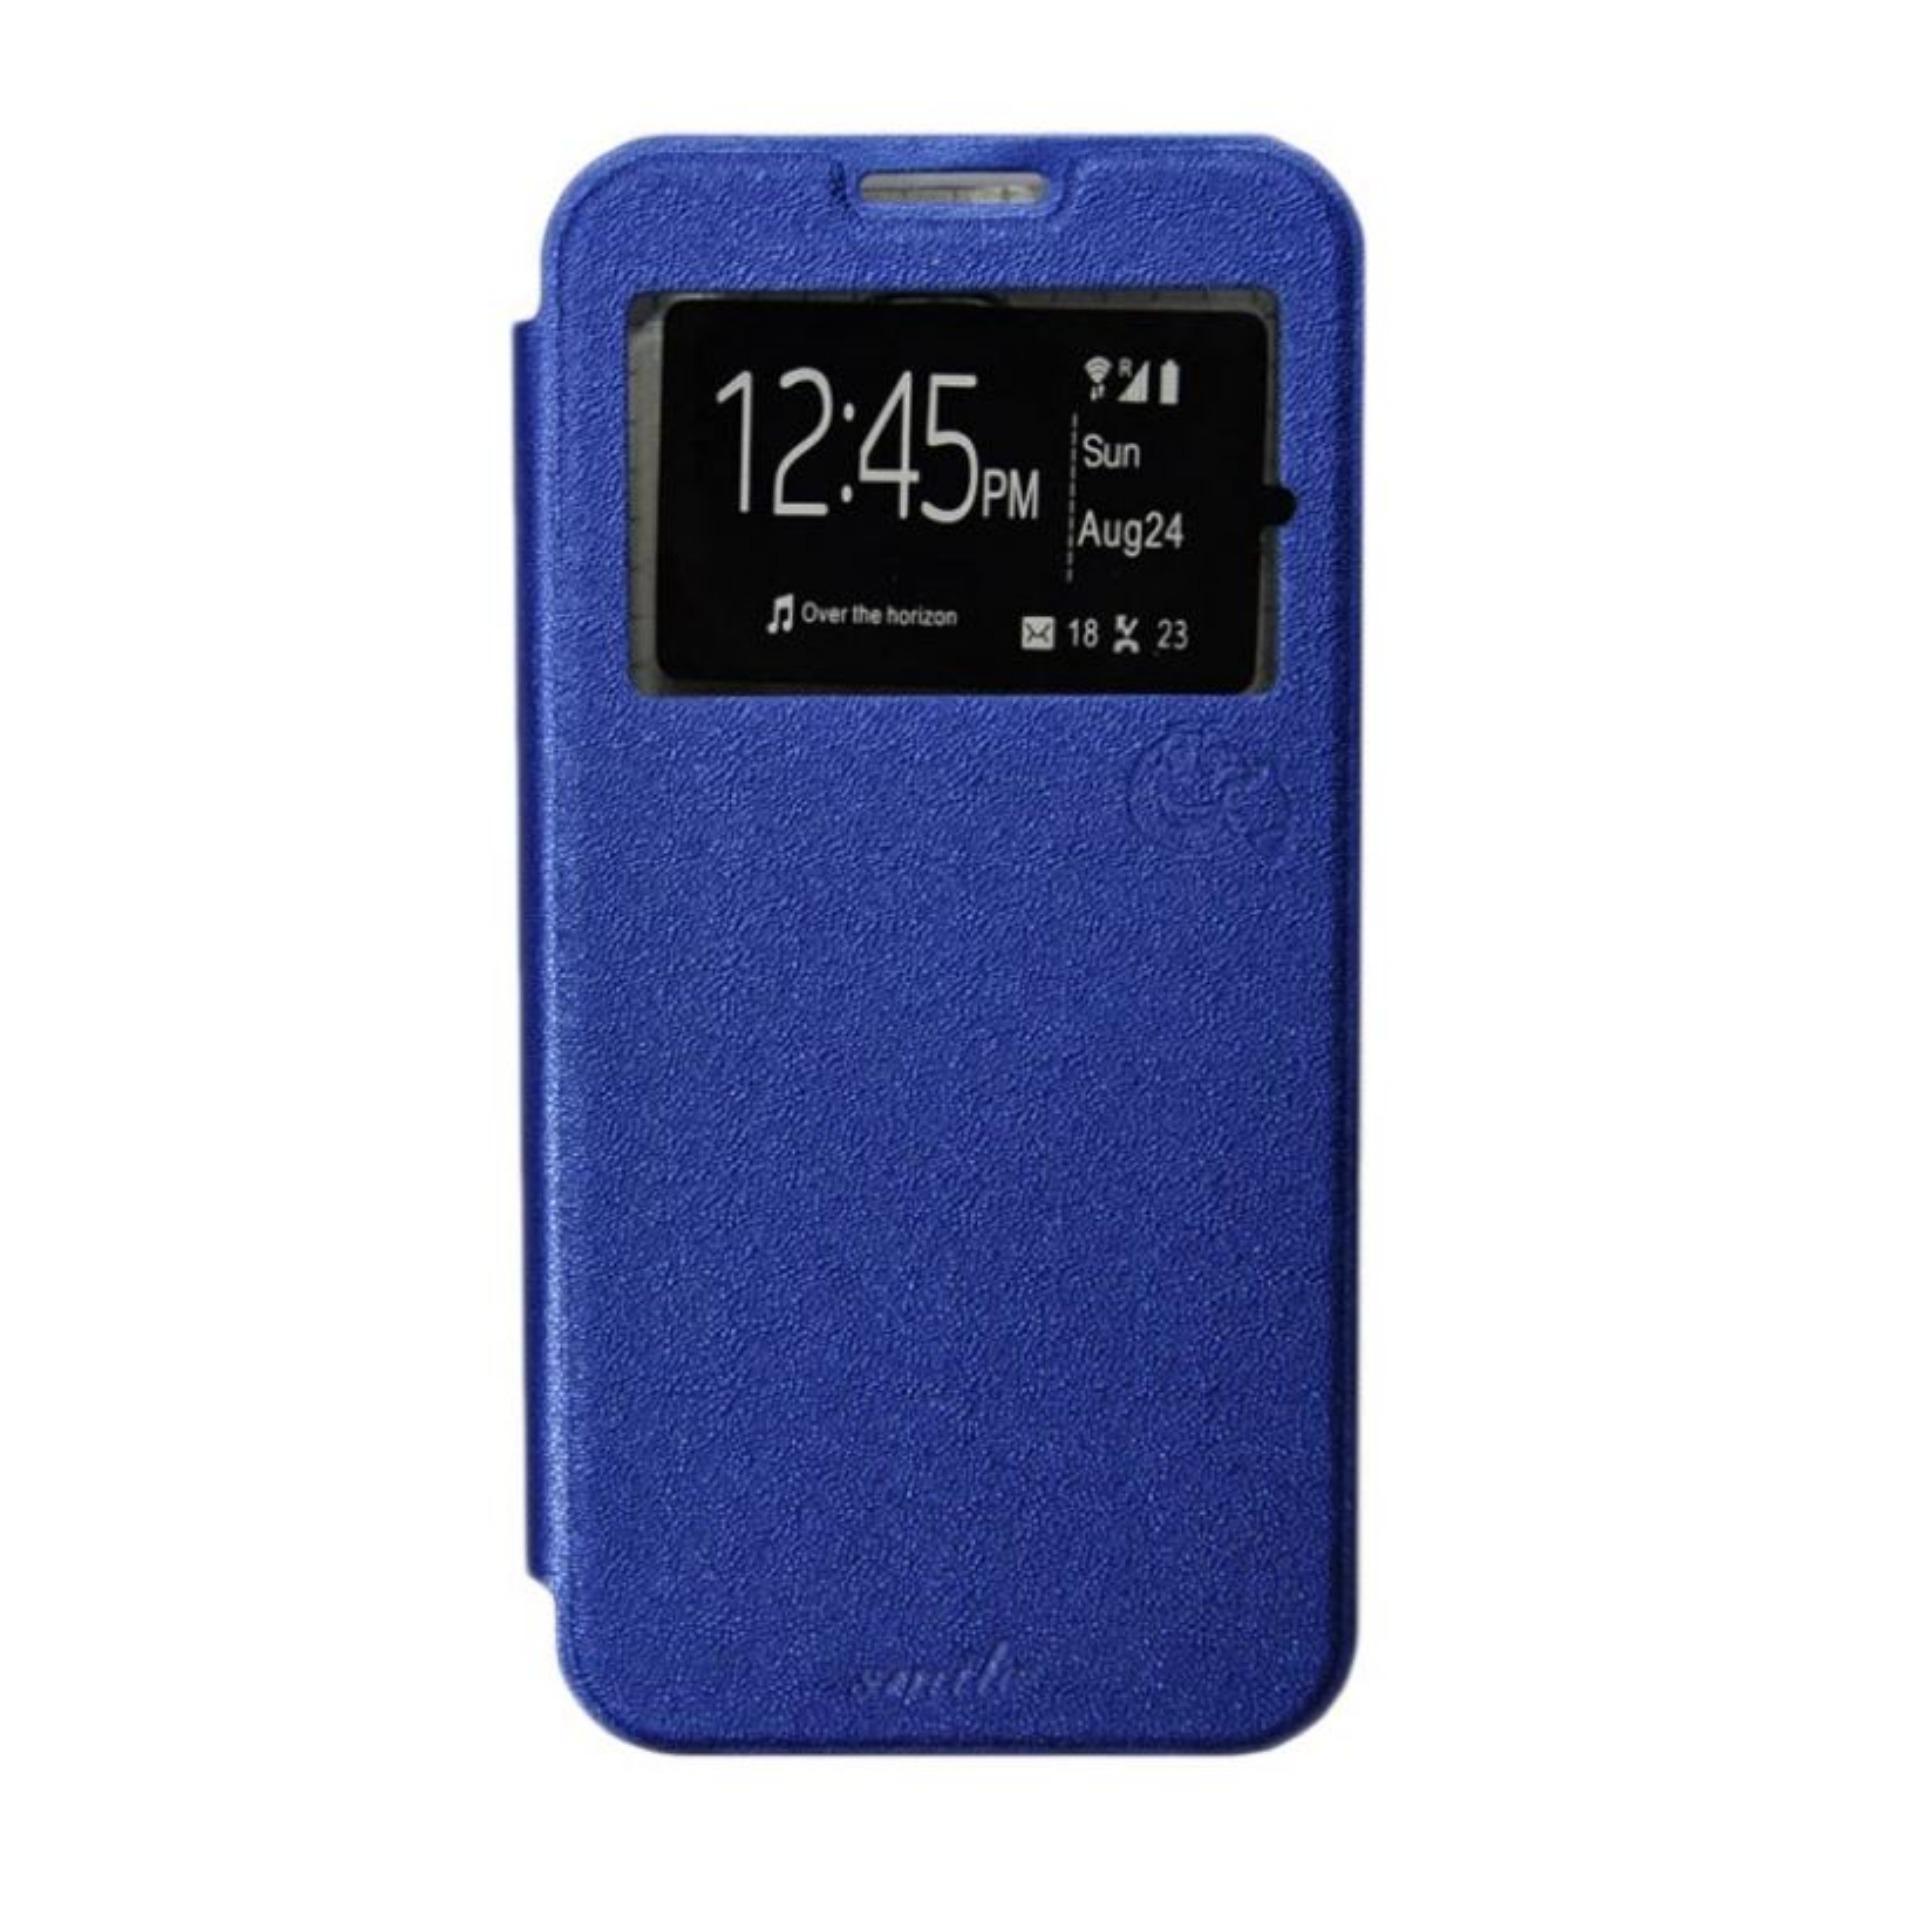 Aldora Case For Infinix X600 / Note 2 Flip Cover Case Dengan Pelindung Layar Smile Series - Blue Na